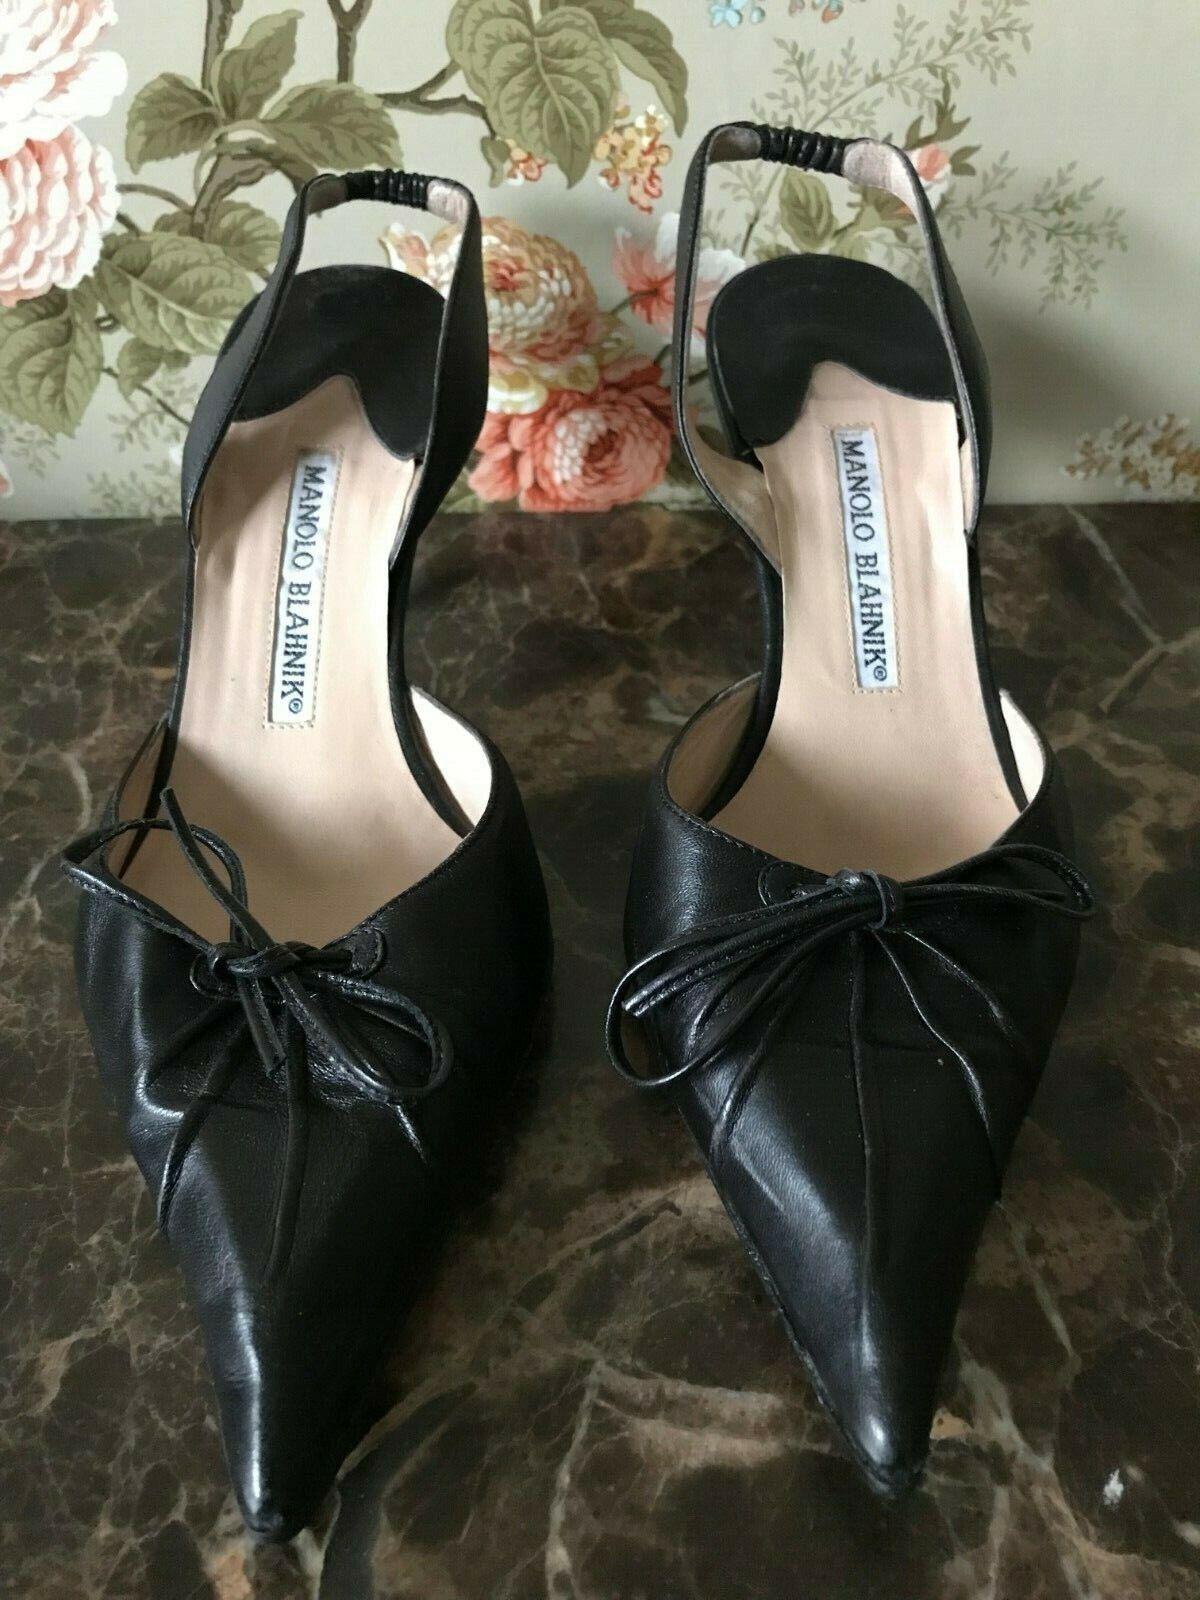 Manolo Blahnik Black Leather Slingback Pumps - Size 37